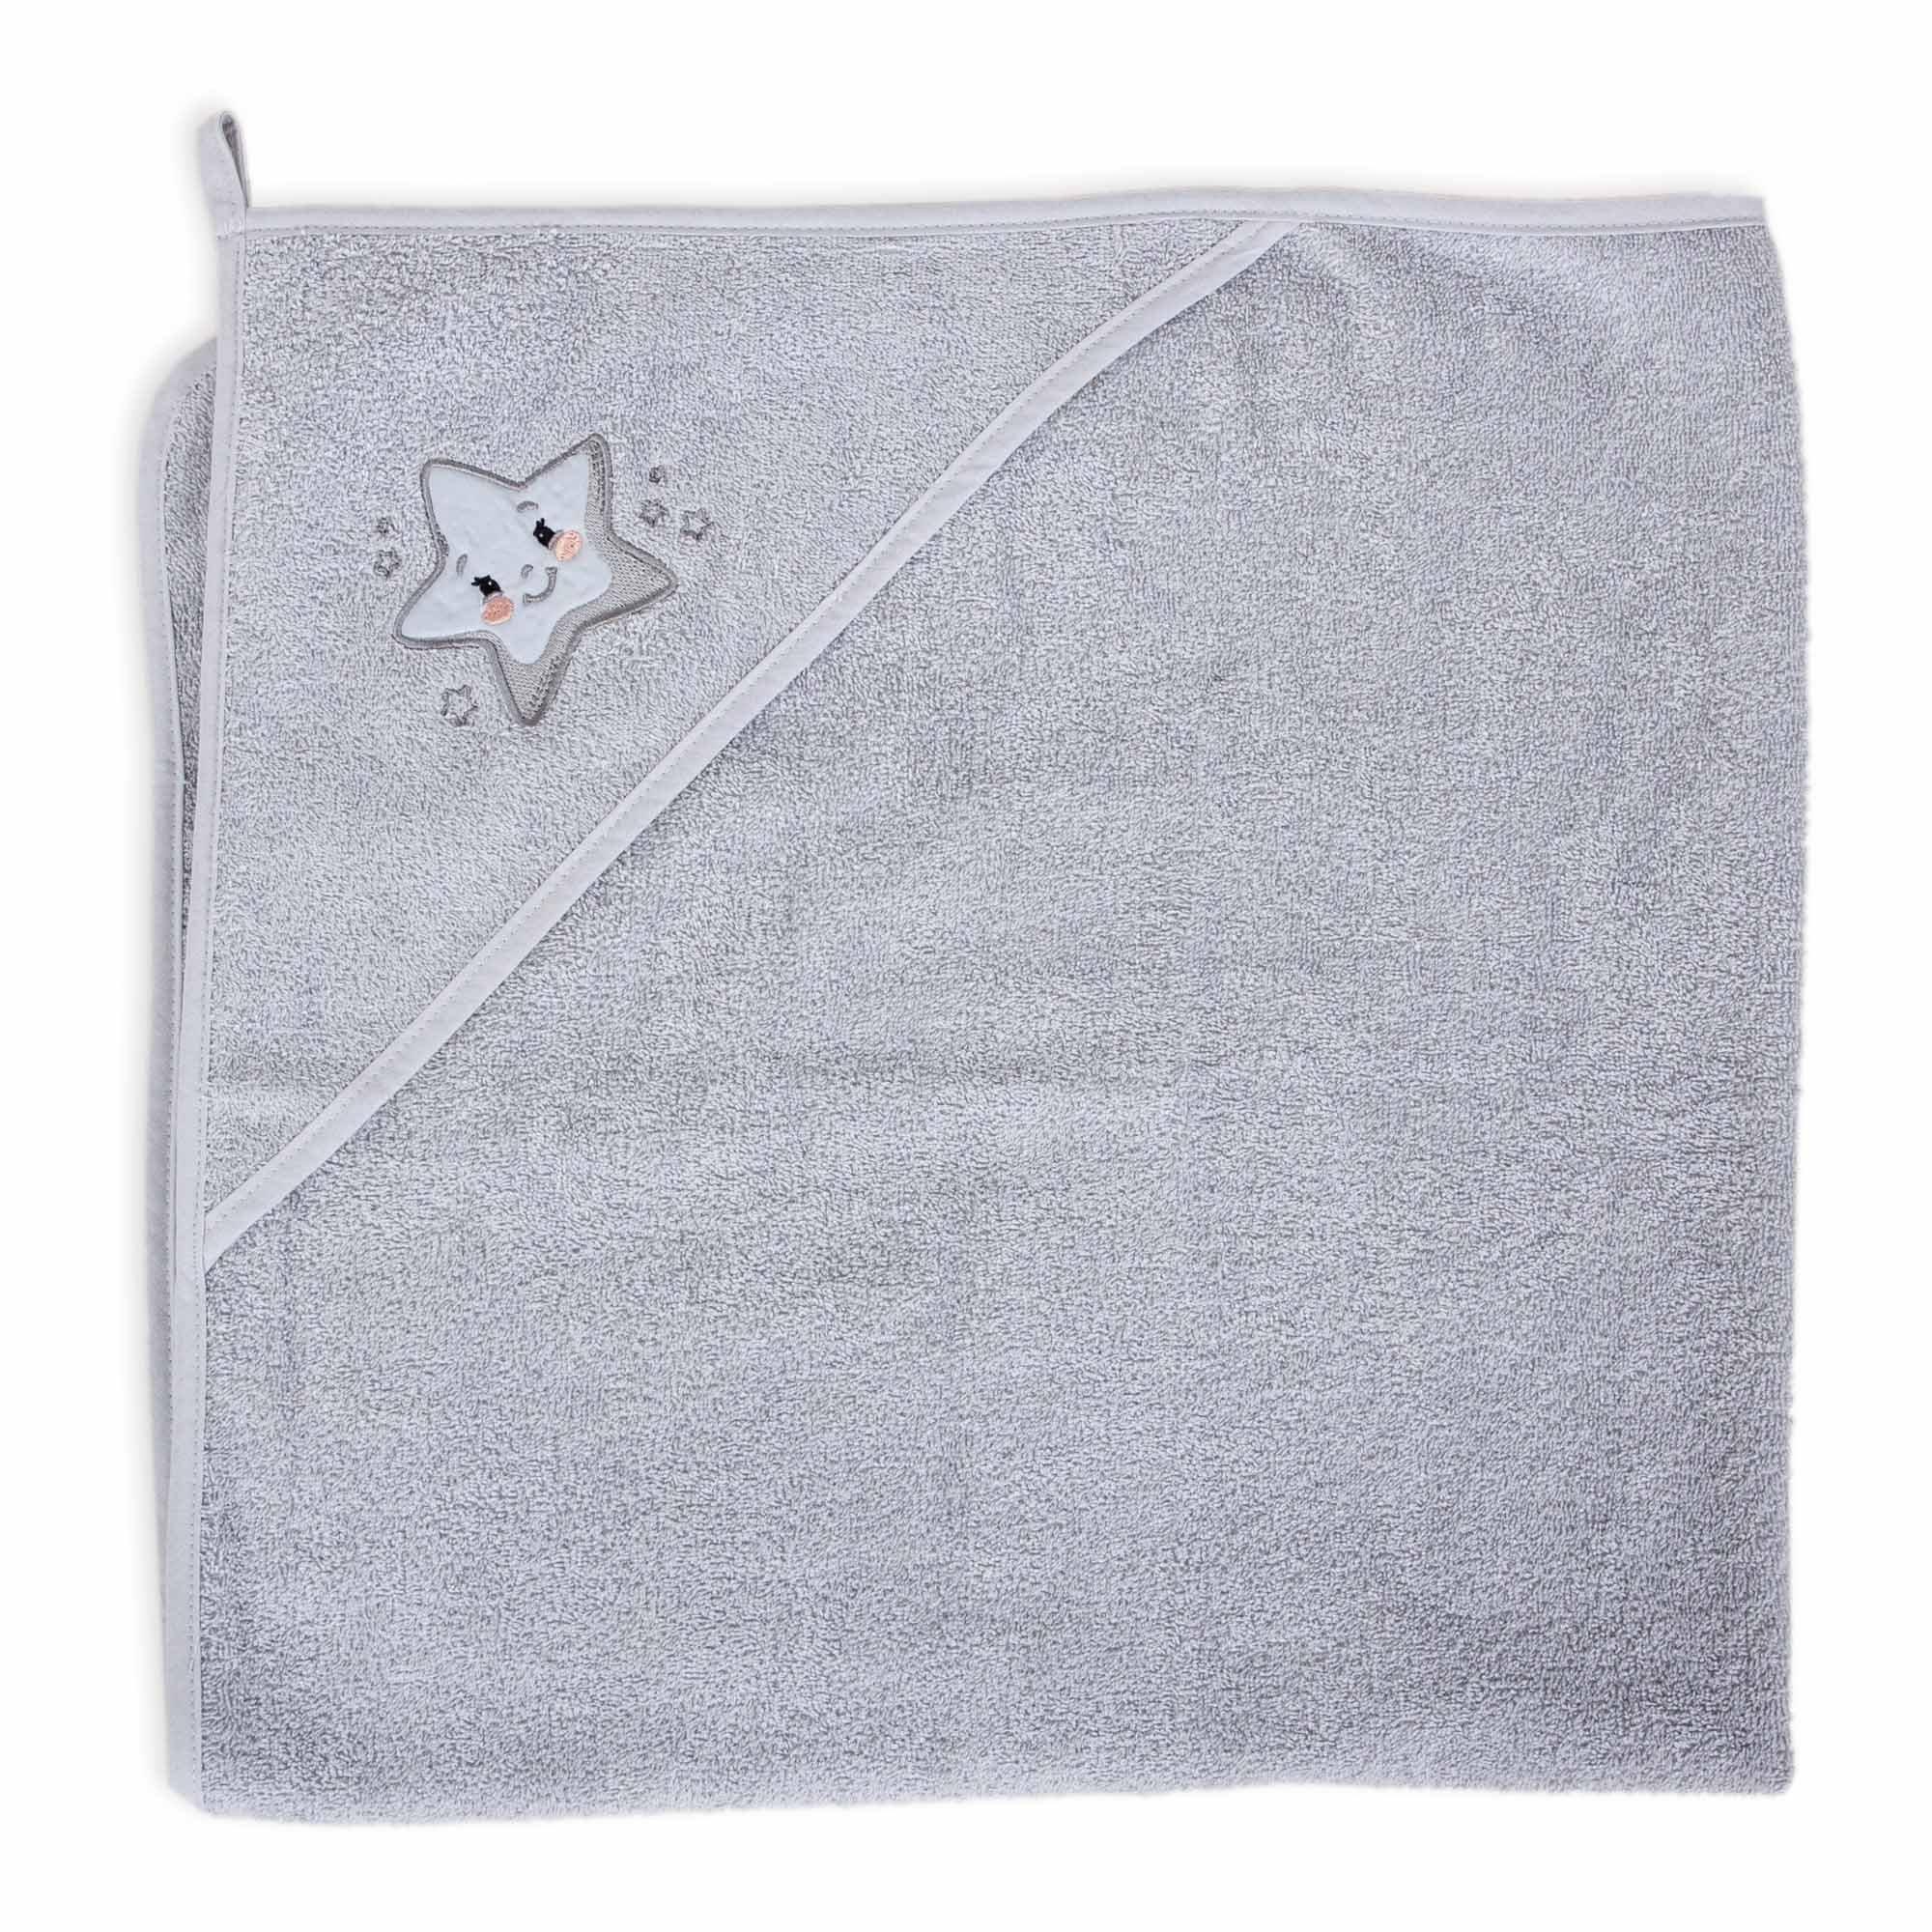 Osu�ka s kapuc�ou Star 100x100 cm - zv��i� obr�zok